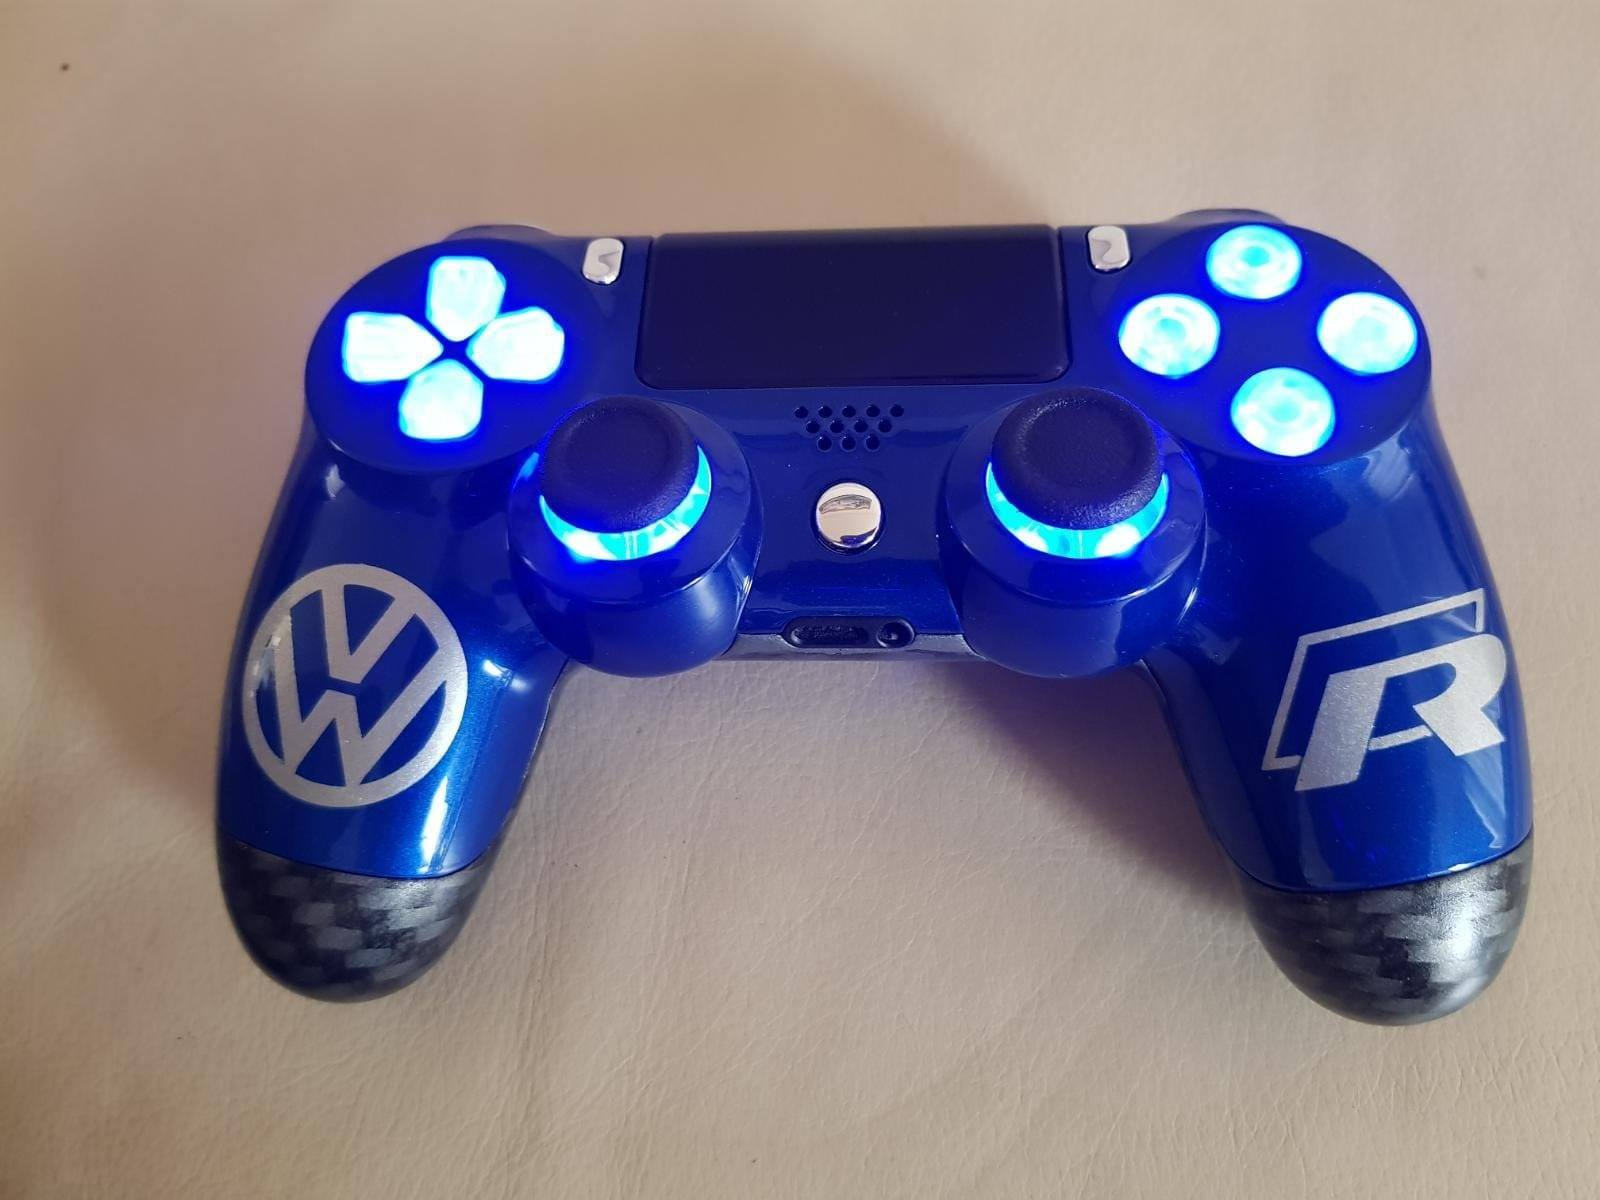 ps4 controller custom vw volkswagen golf 7 R gaming www.fsb-dip.nl hydrodipping